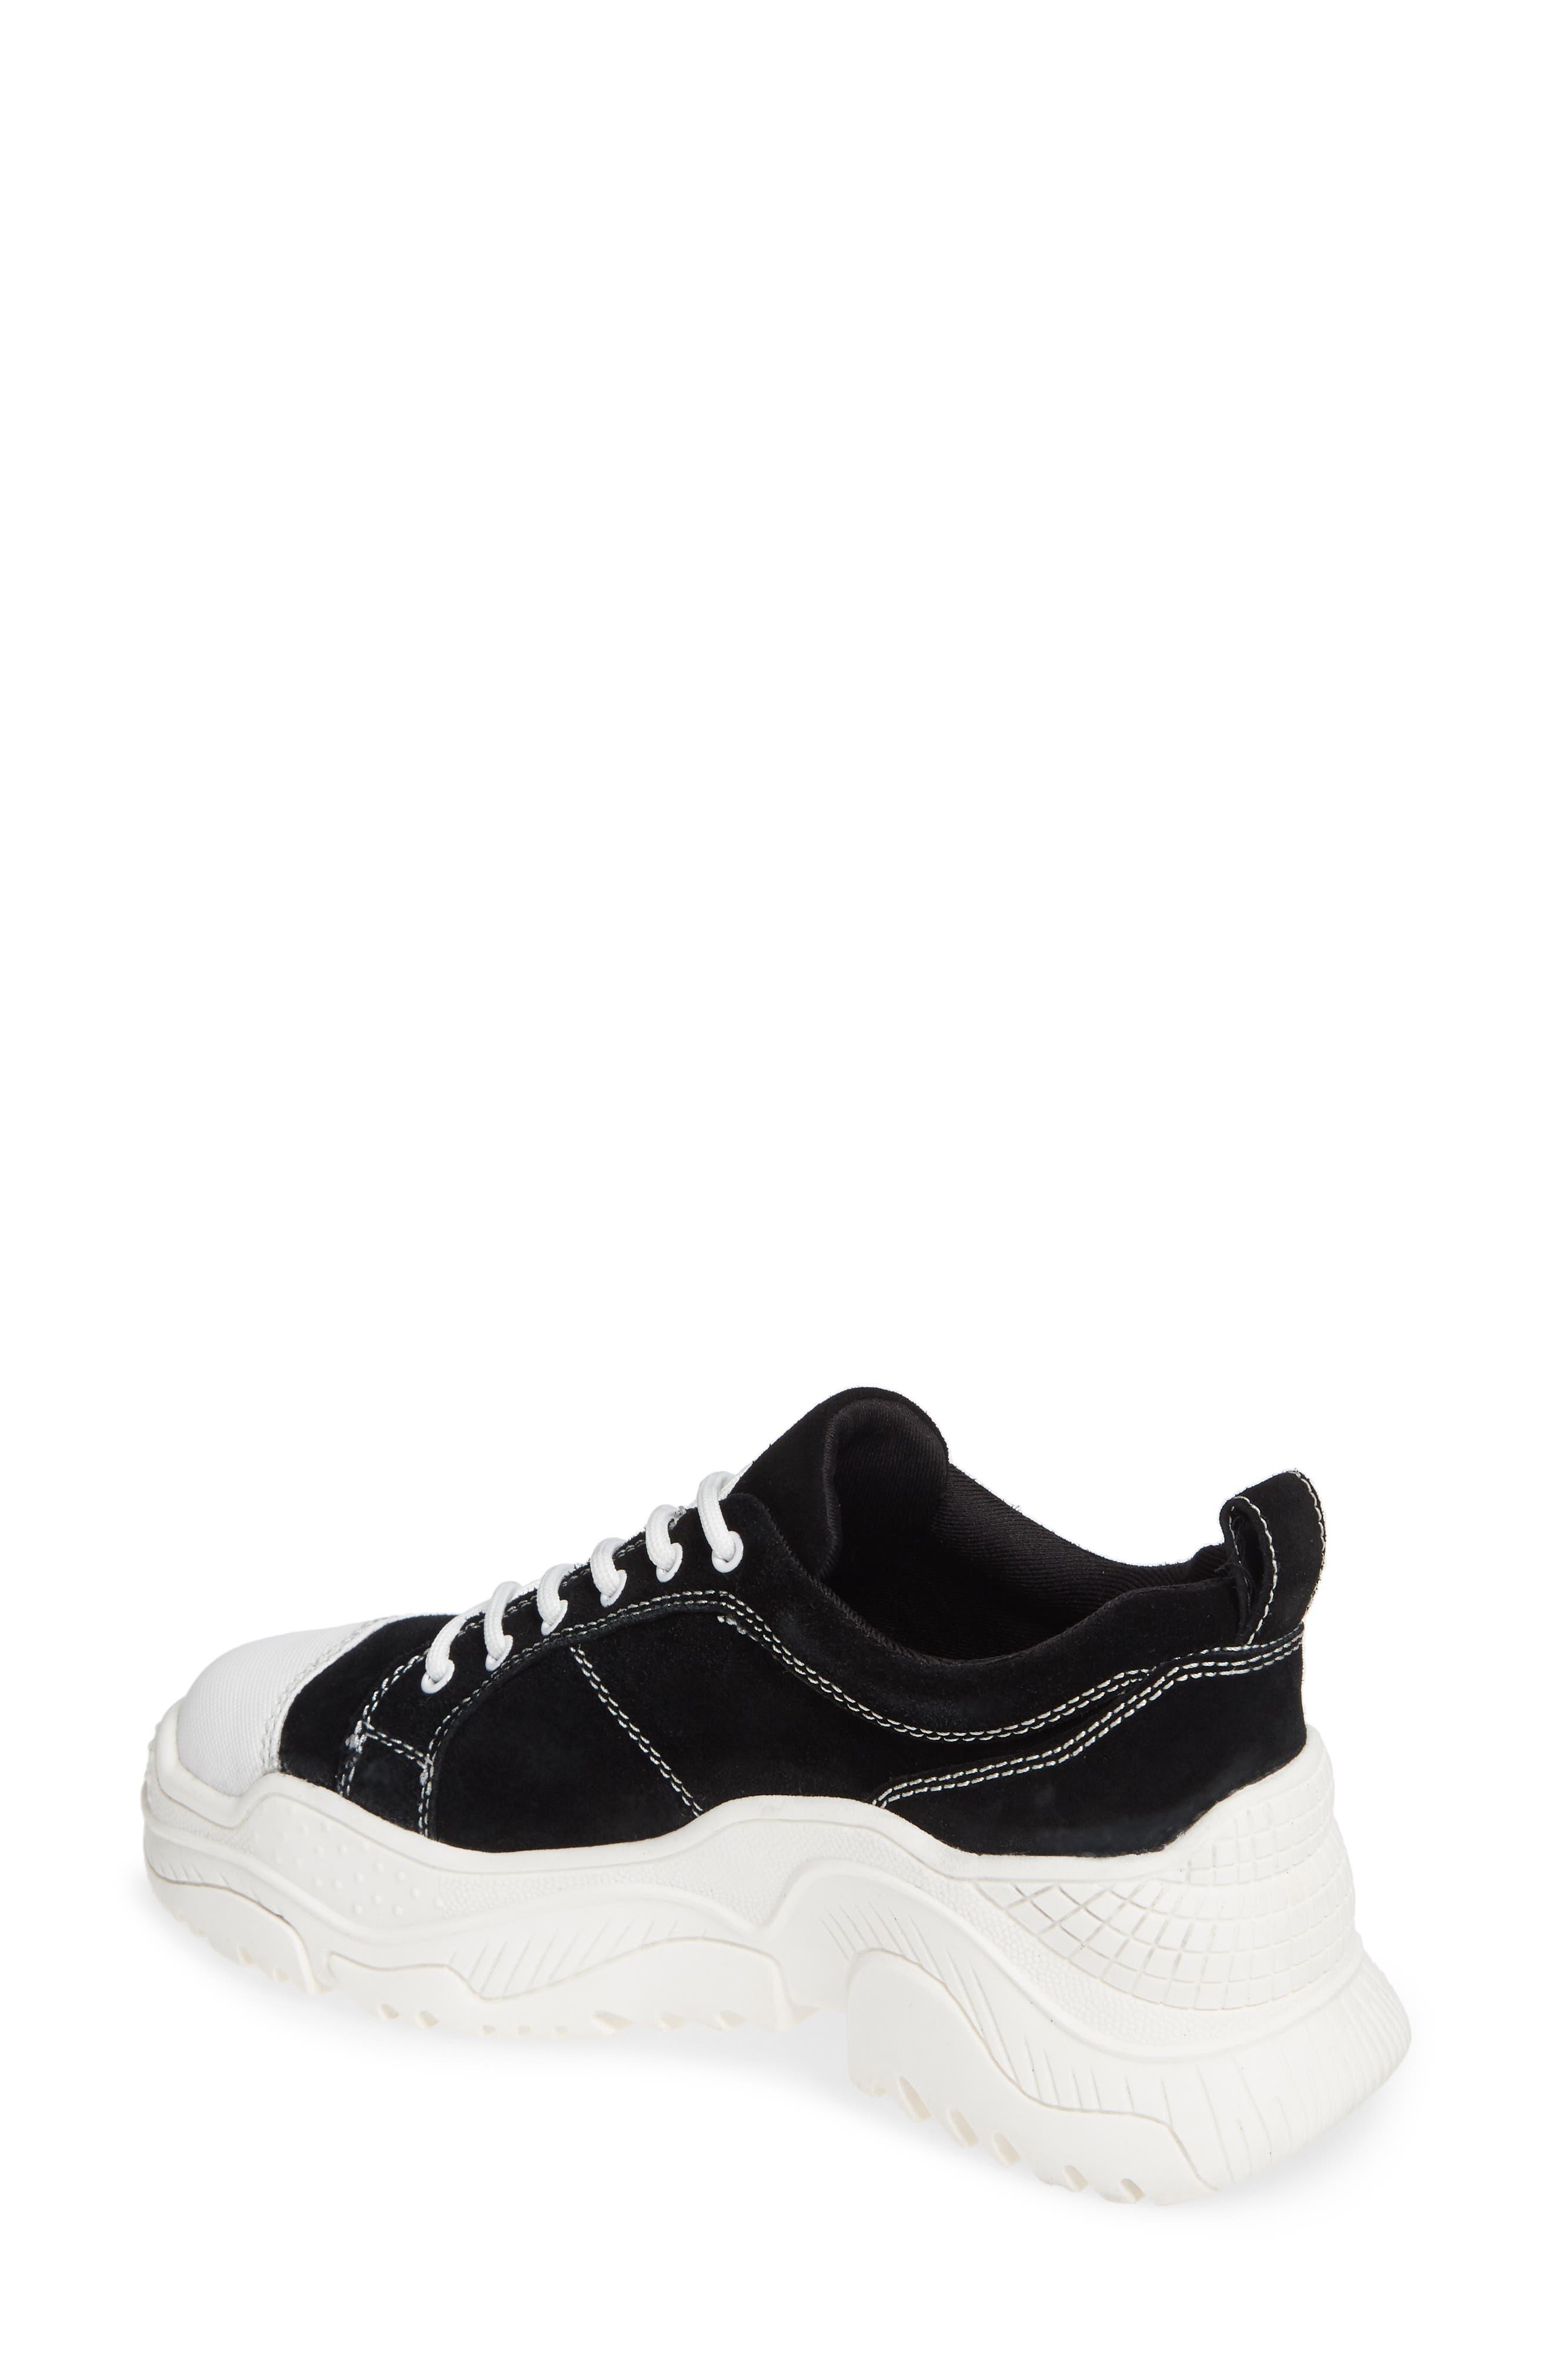 JEFFREY CAMPBELL, Remnant Sneaker, Alternate thumbnail 2, color, BLACK SUEDE WHITE